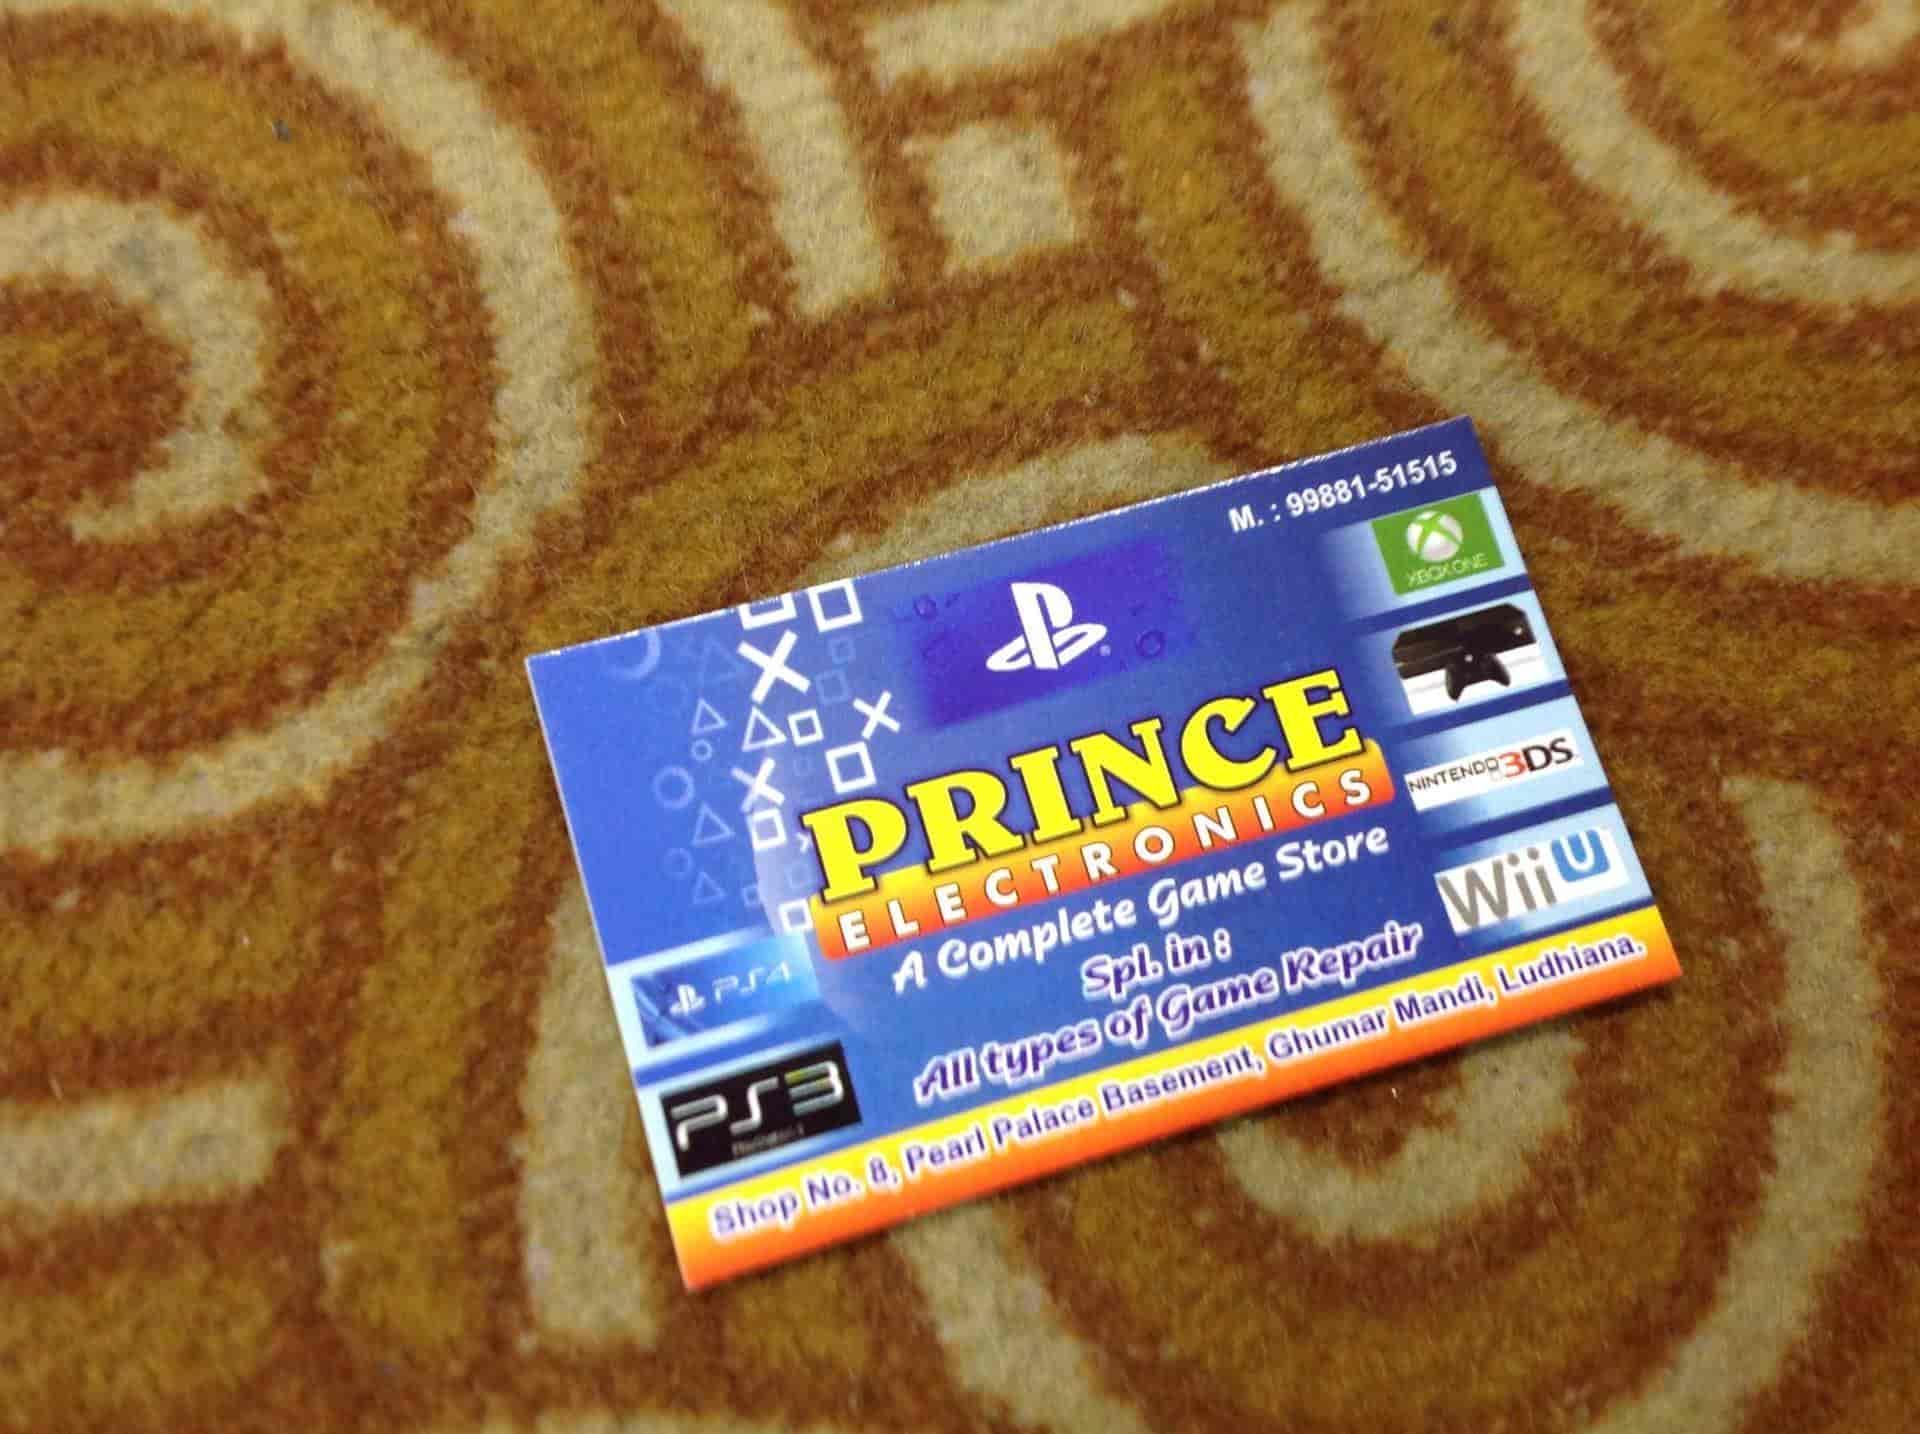 Prince Electronics Reviews, Ghumar Mandi, Ludhiana - 86